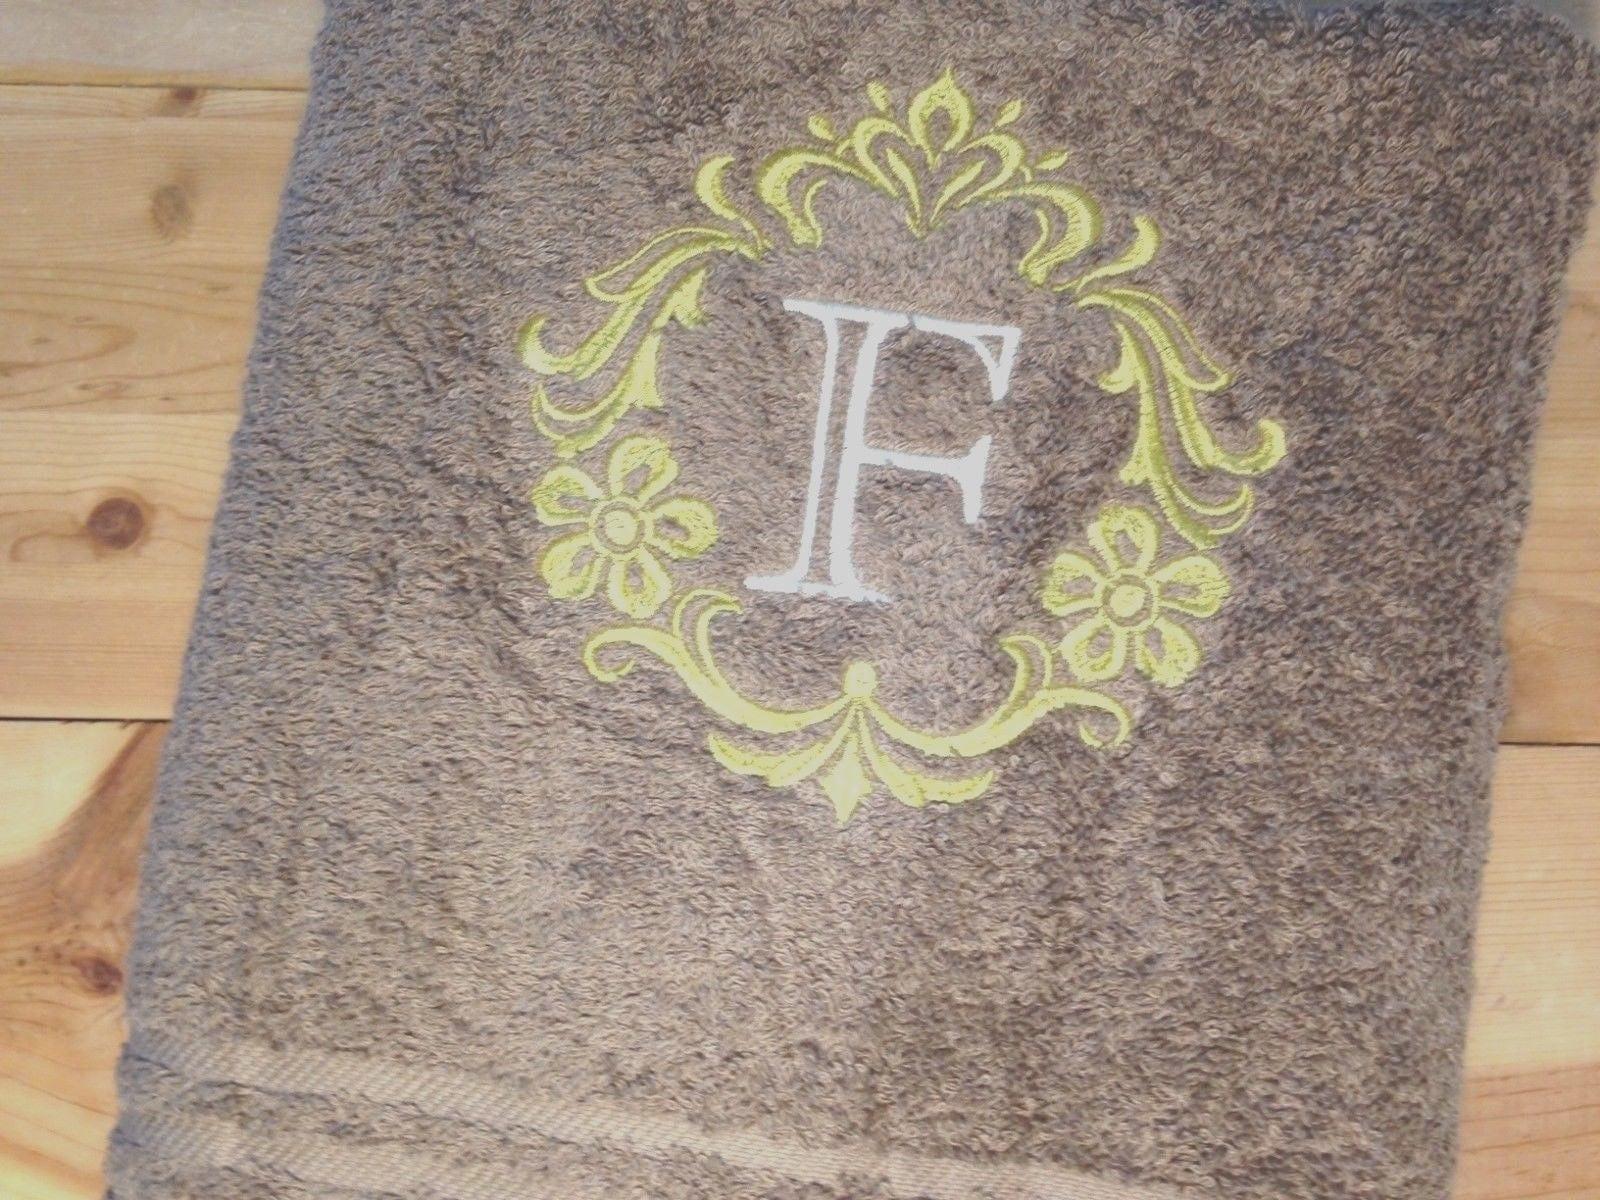 Monogram bathroom towels - Elegant Damask F Monogram Bath Towel Tan Gold Cream Embroidered Bathroom Towel Personalized Monogrammed Towels Embroidered Bath Towels